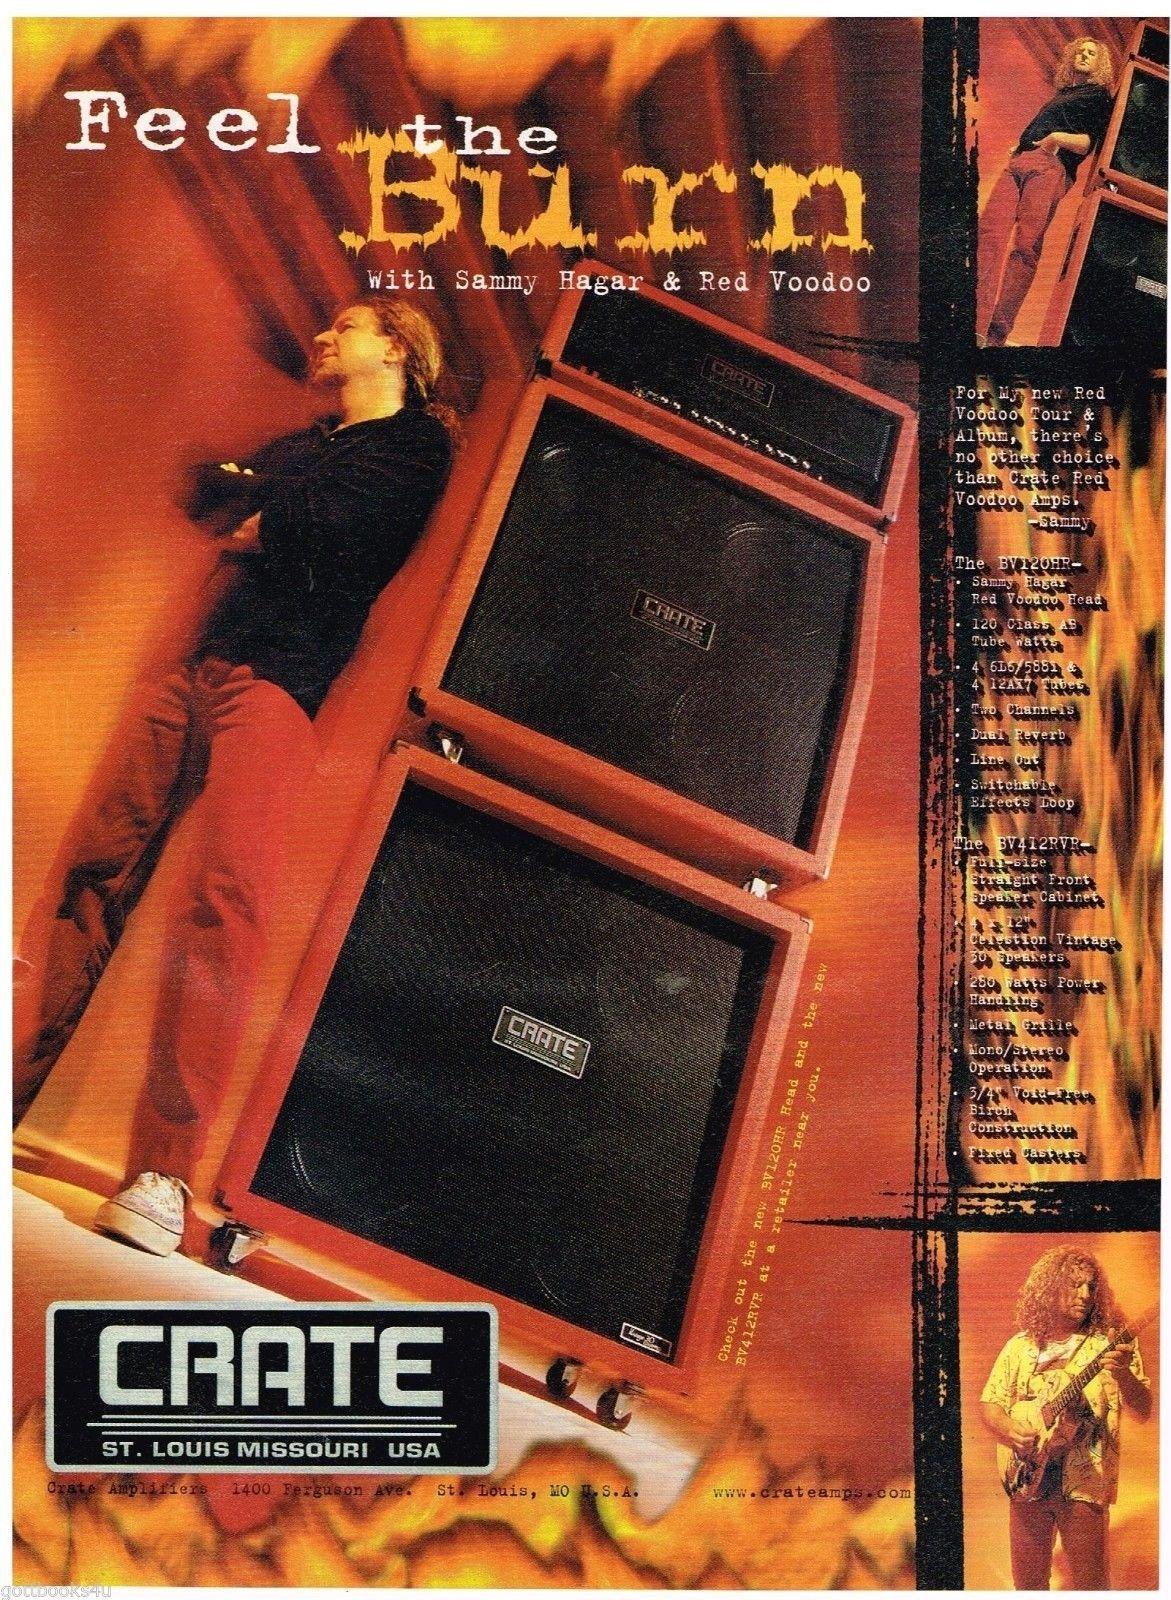 Crate Amps Sammy Hagar Red Voodoo 1999 Print Advertisement Crate 0613161377555 Amazon Com Books